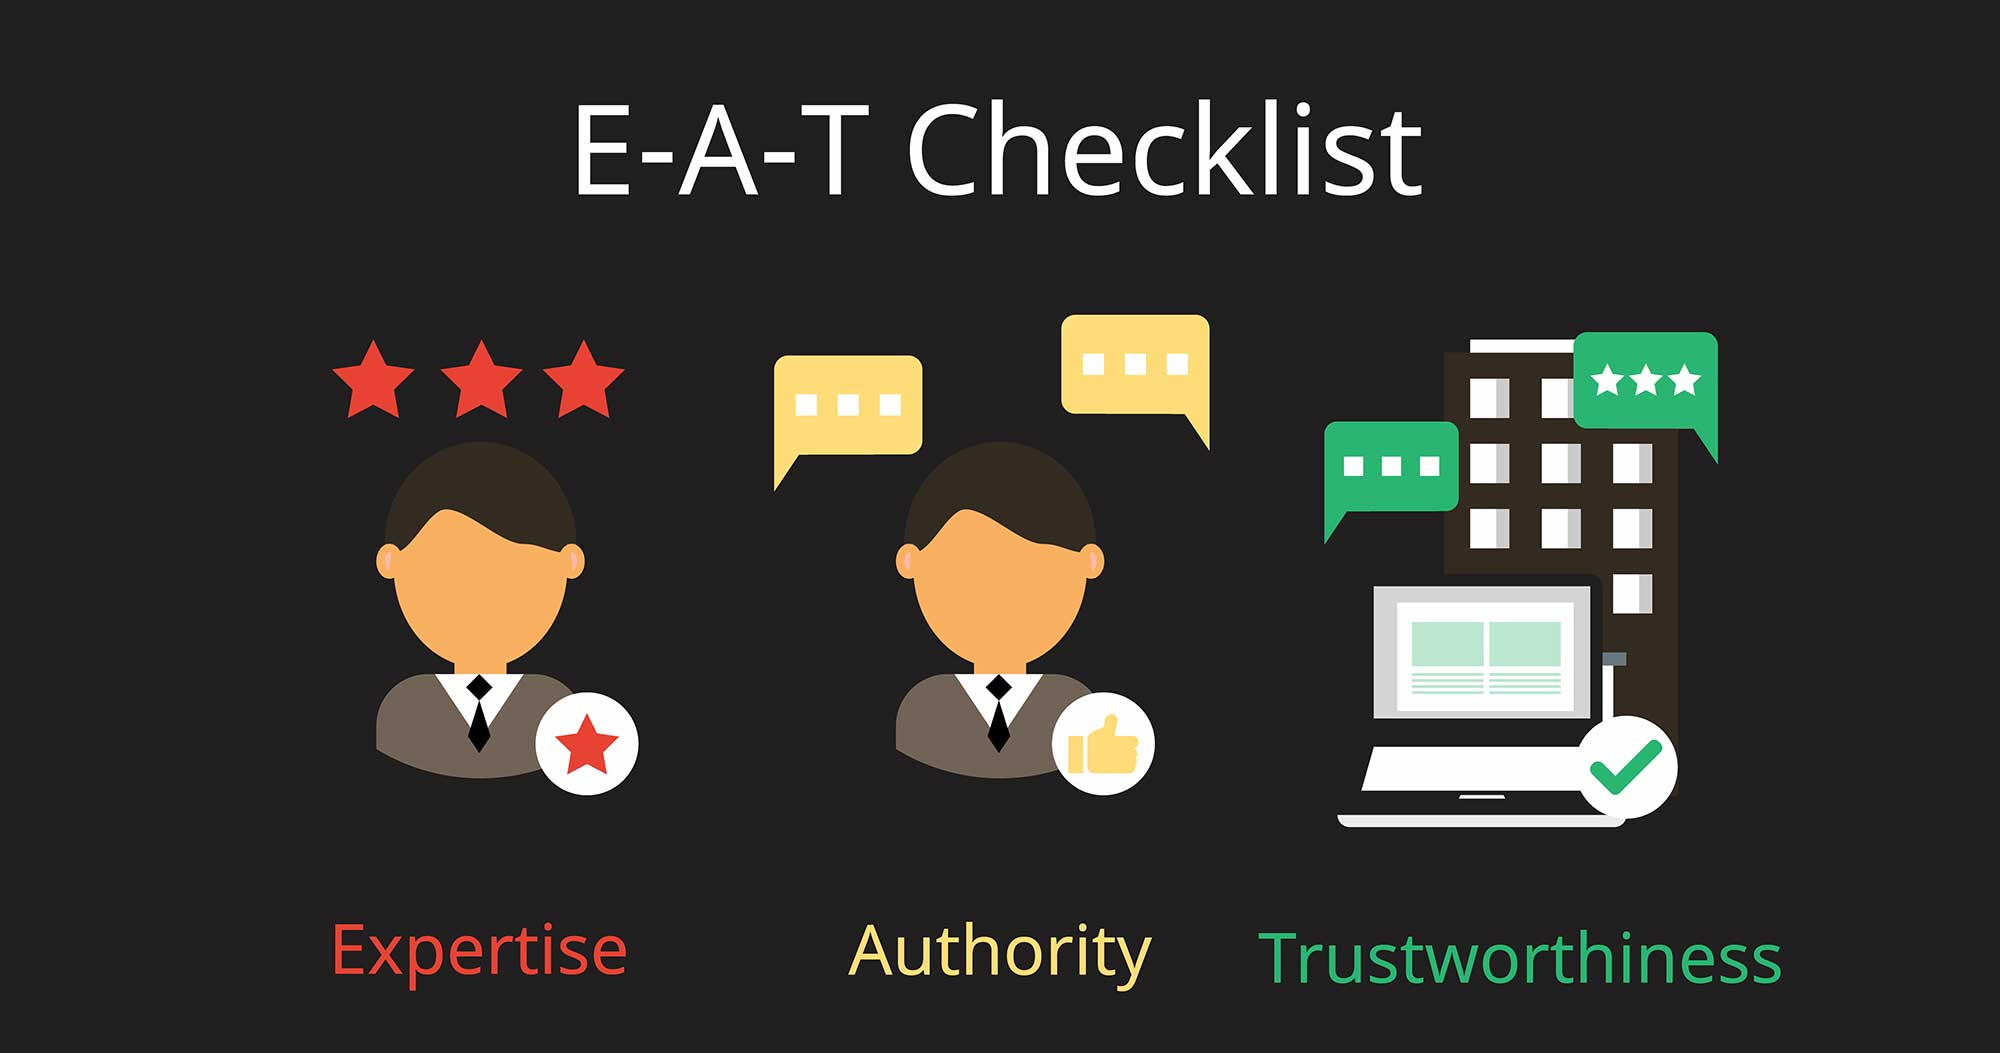 E-A-Tとは?SEOでの重要性と対策まとめ